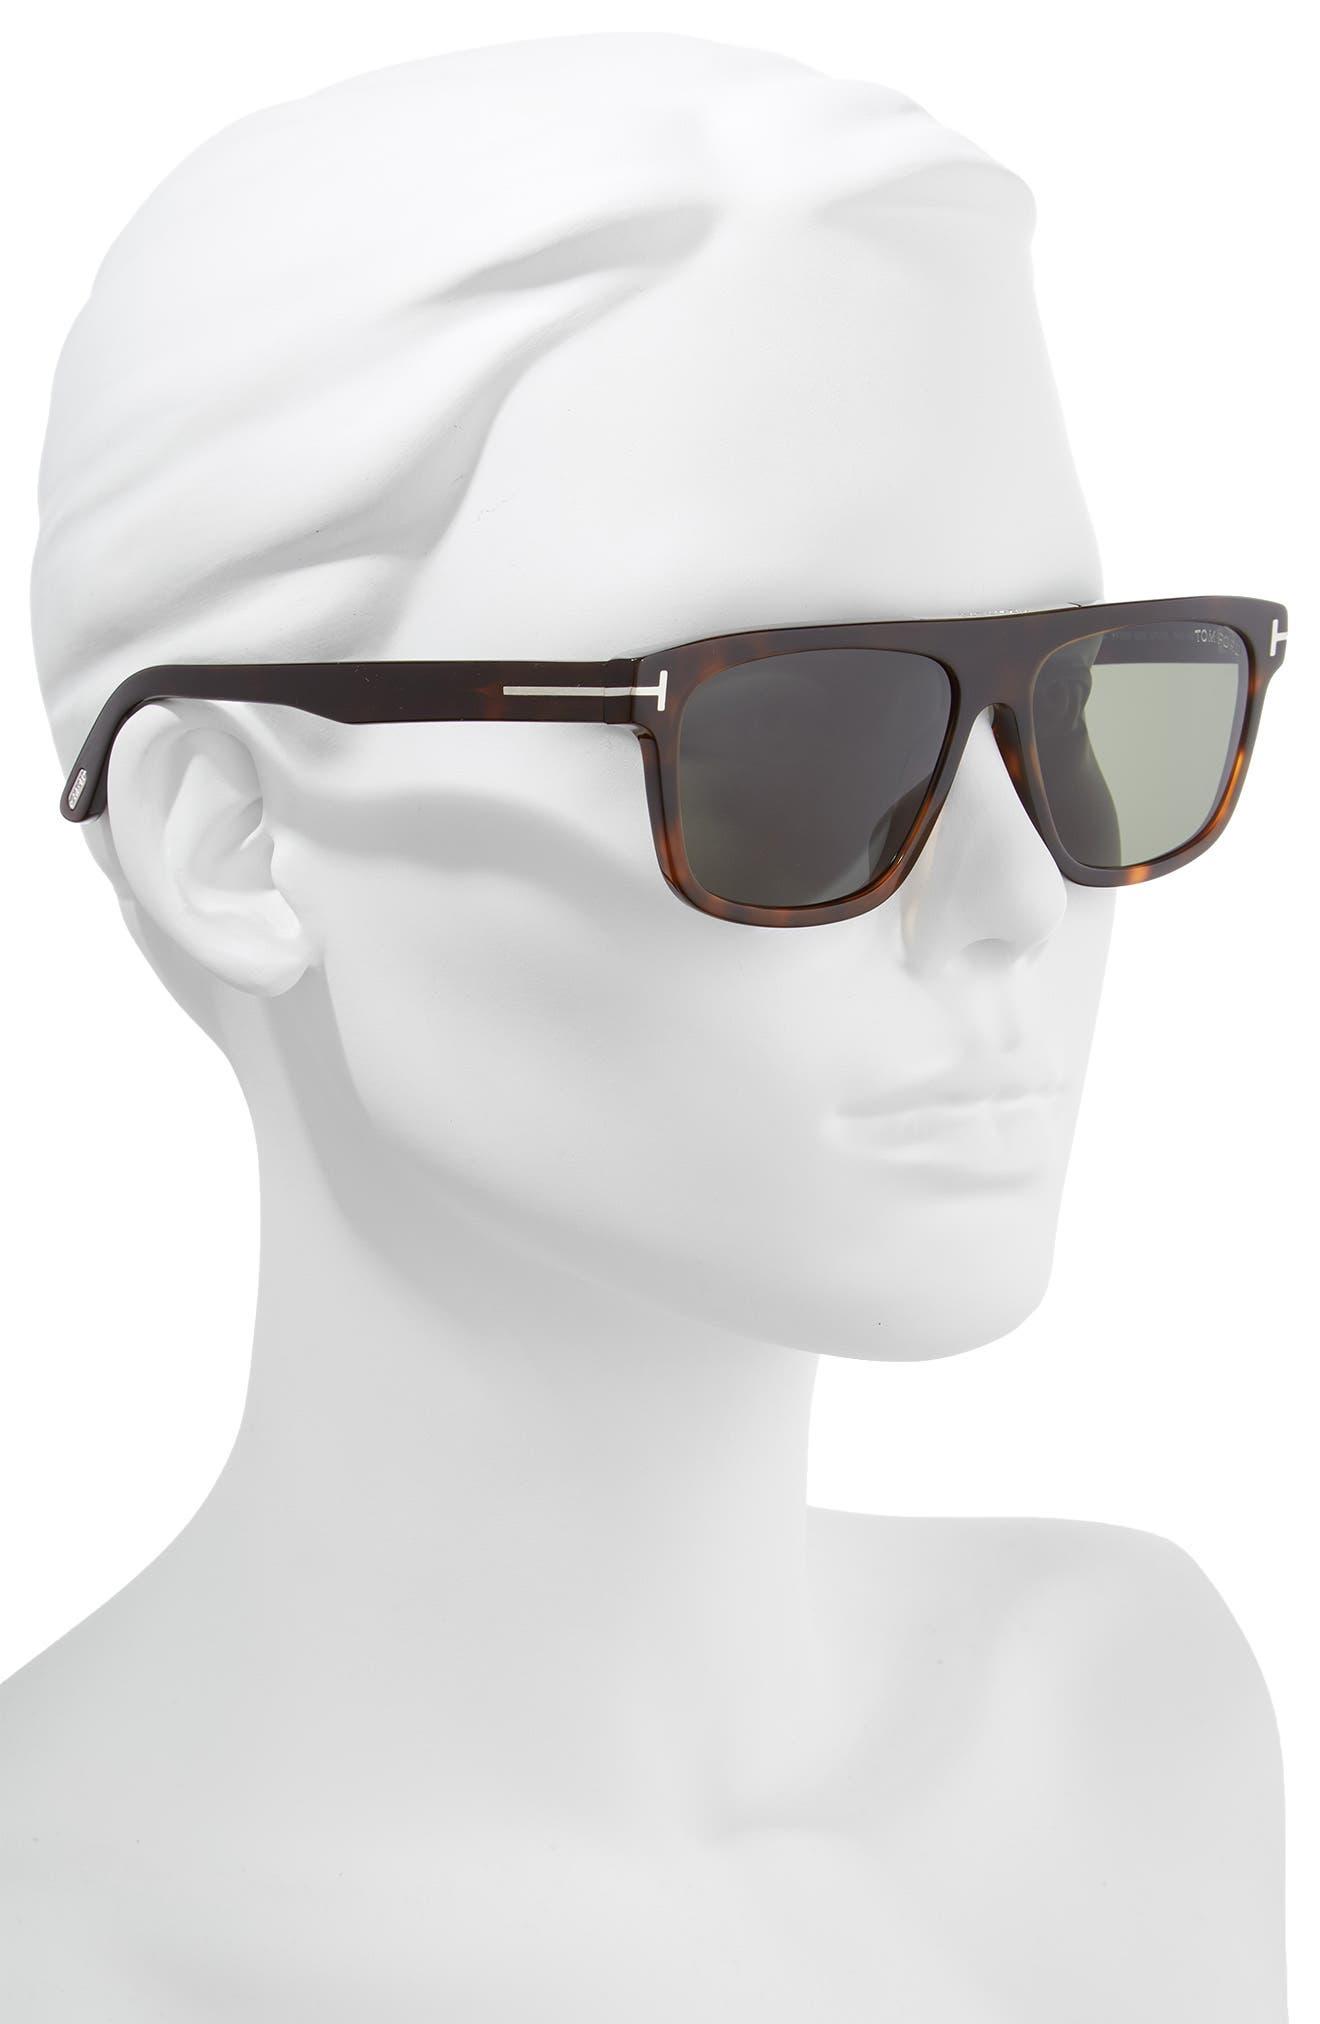 Cecilio 57mm Blue Block Optical Glasses,                             Alternate thumbnail 2, color,                             DARK HAVANA/ GREEN